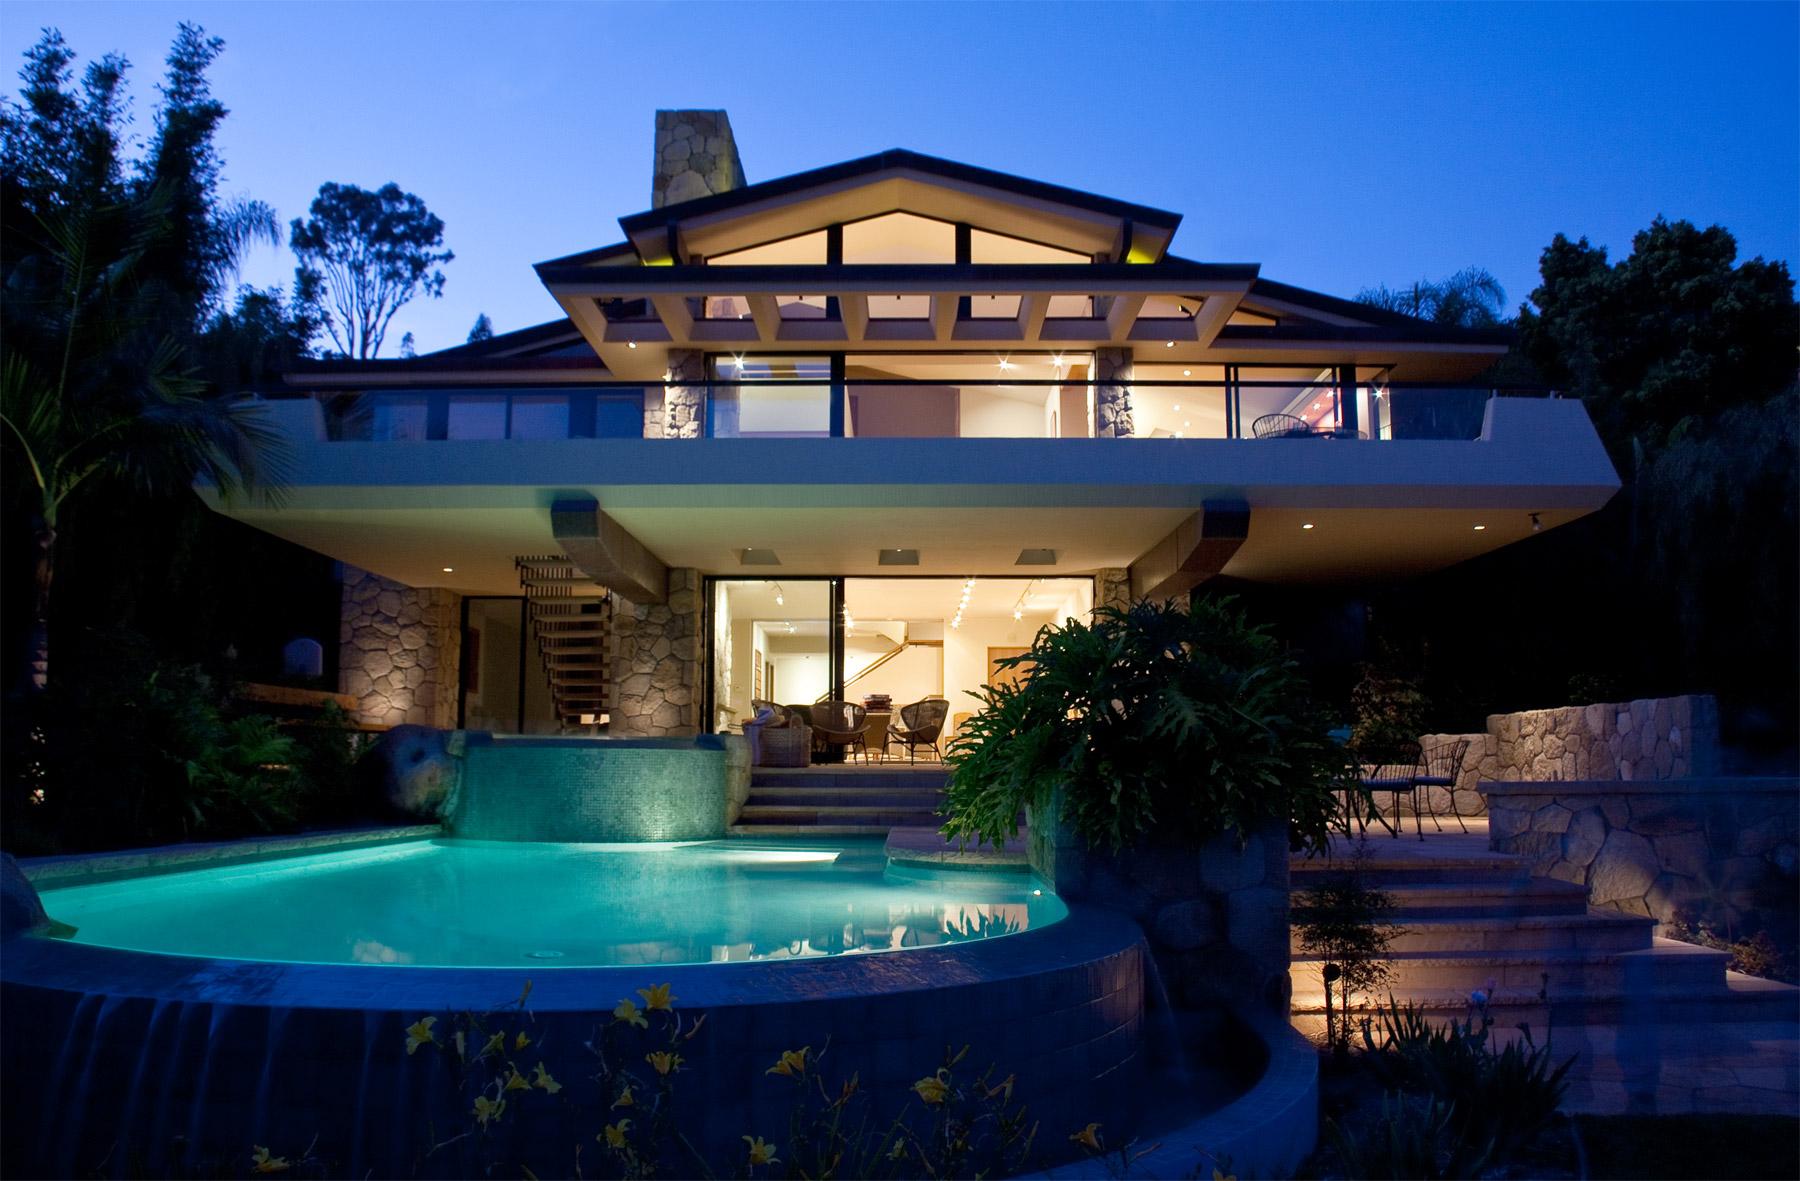 Architecture_Exterior_SantaBarbara.jpg